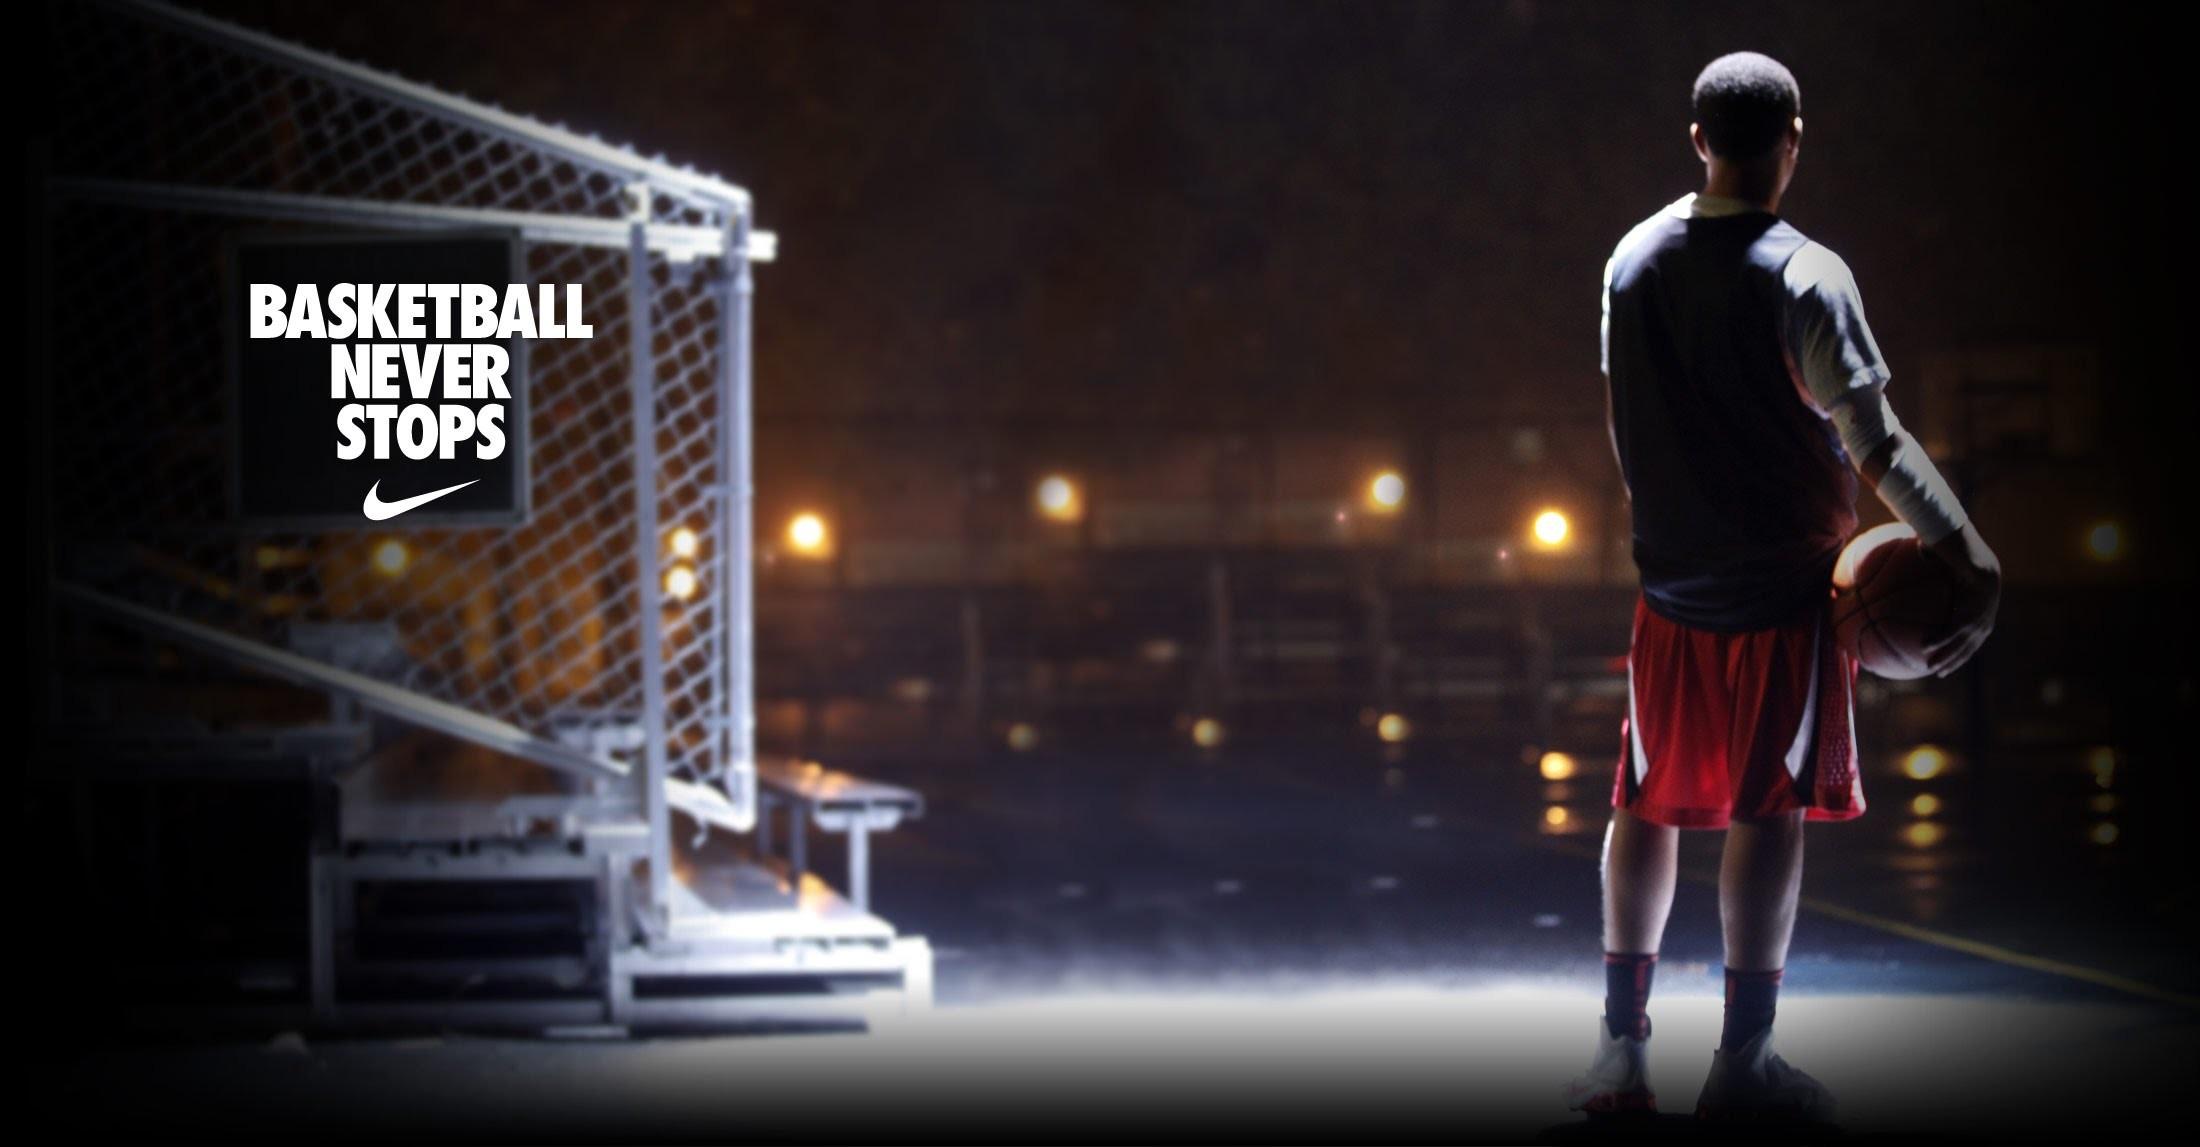 David Beckham Wallpapers Quotes Nike Basketball Wallpaper 58 Images